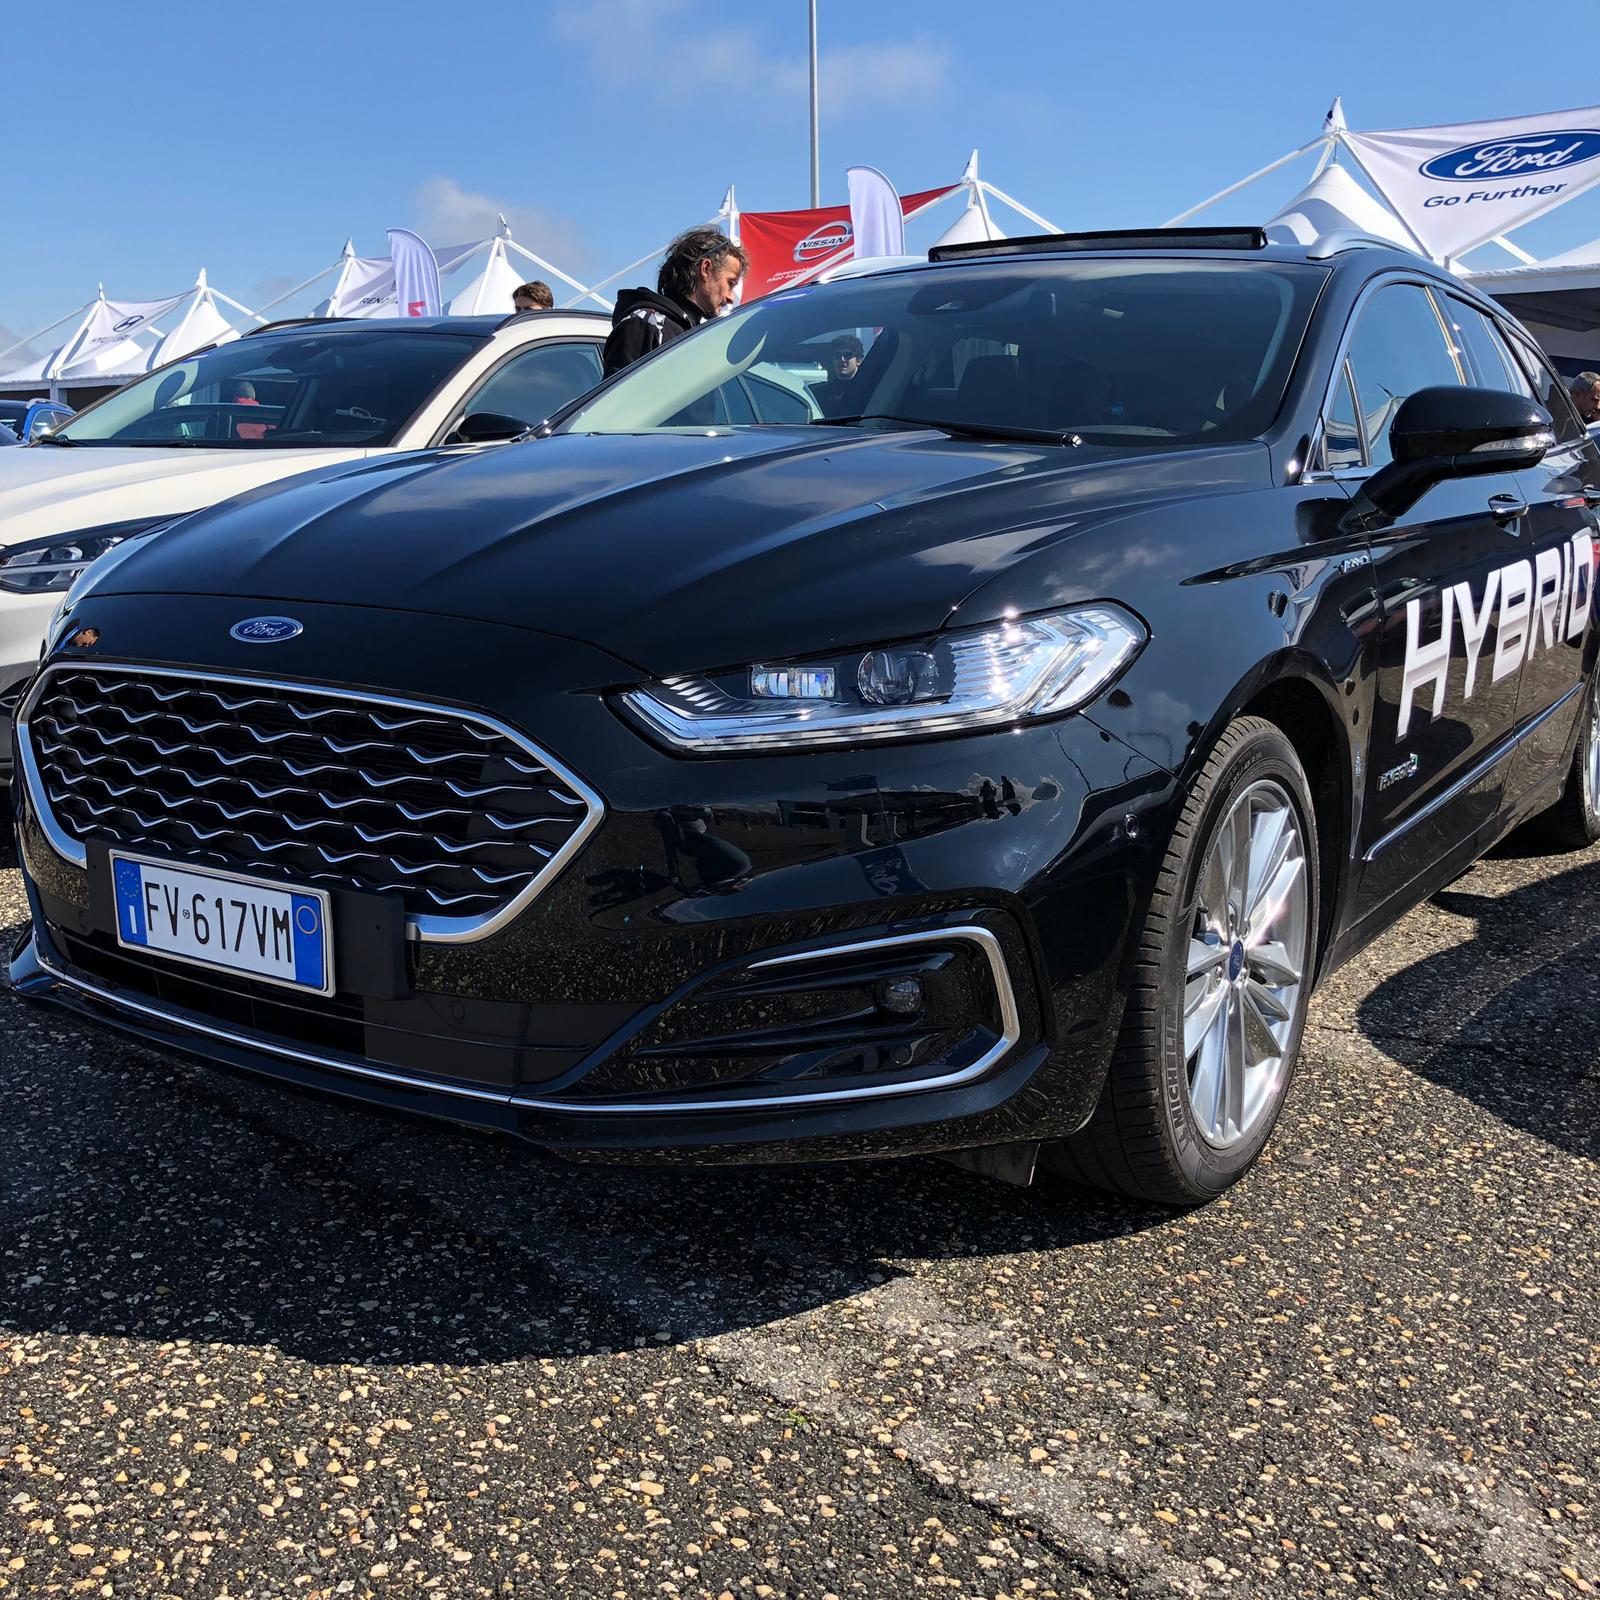 ford-mondeo-hybrid-wagon-fleet-motor-day-2019